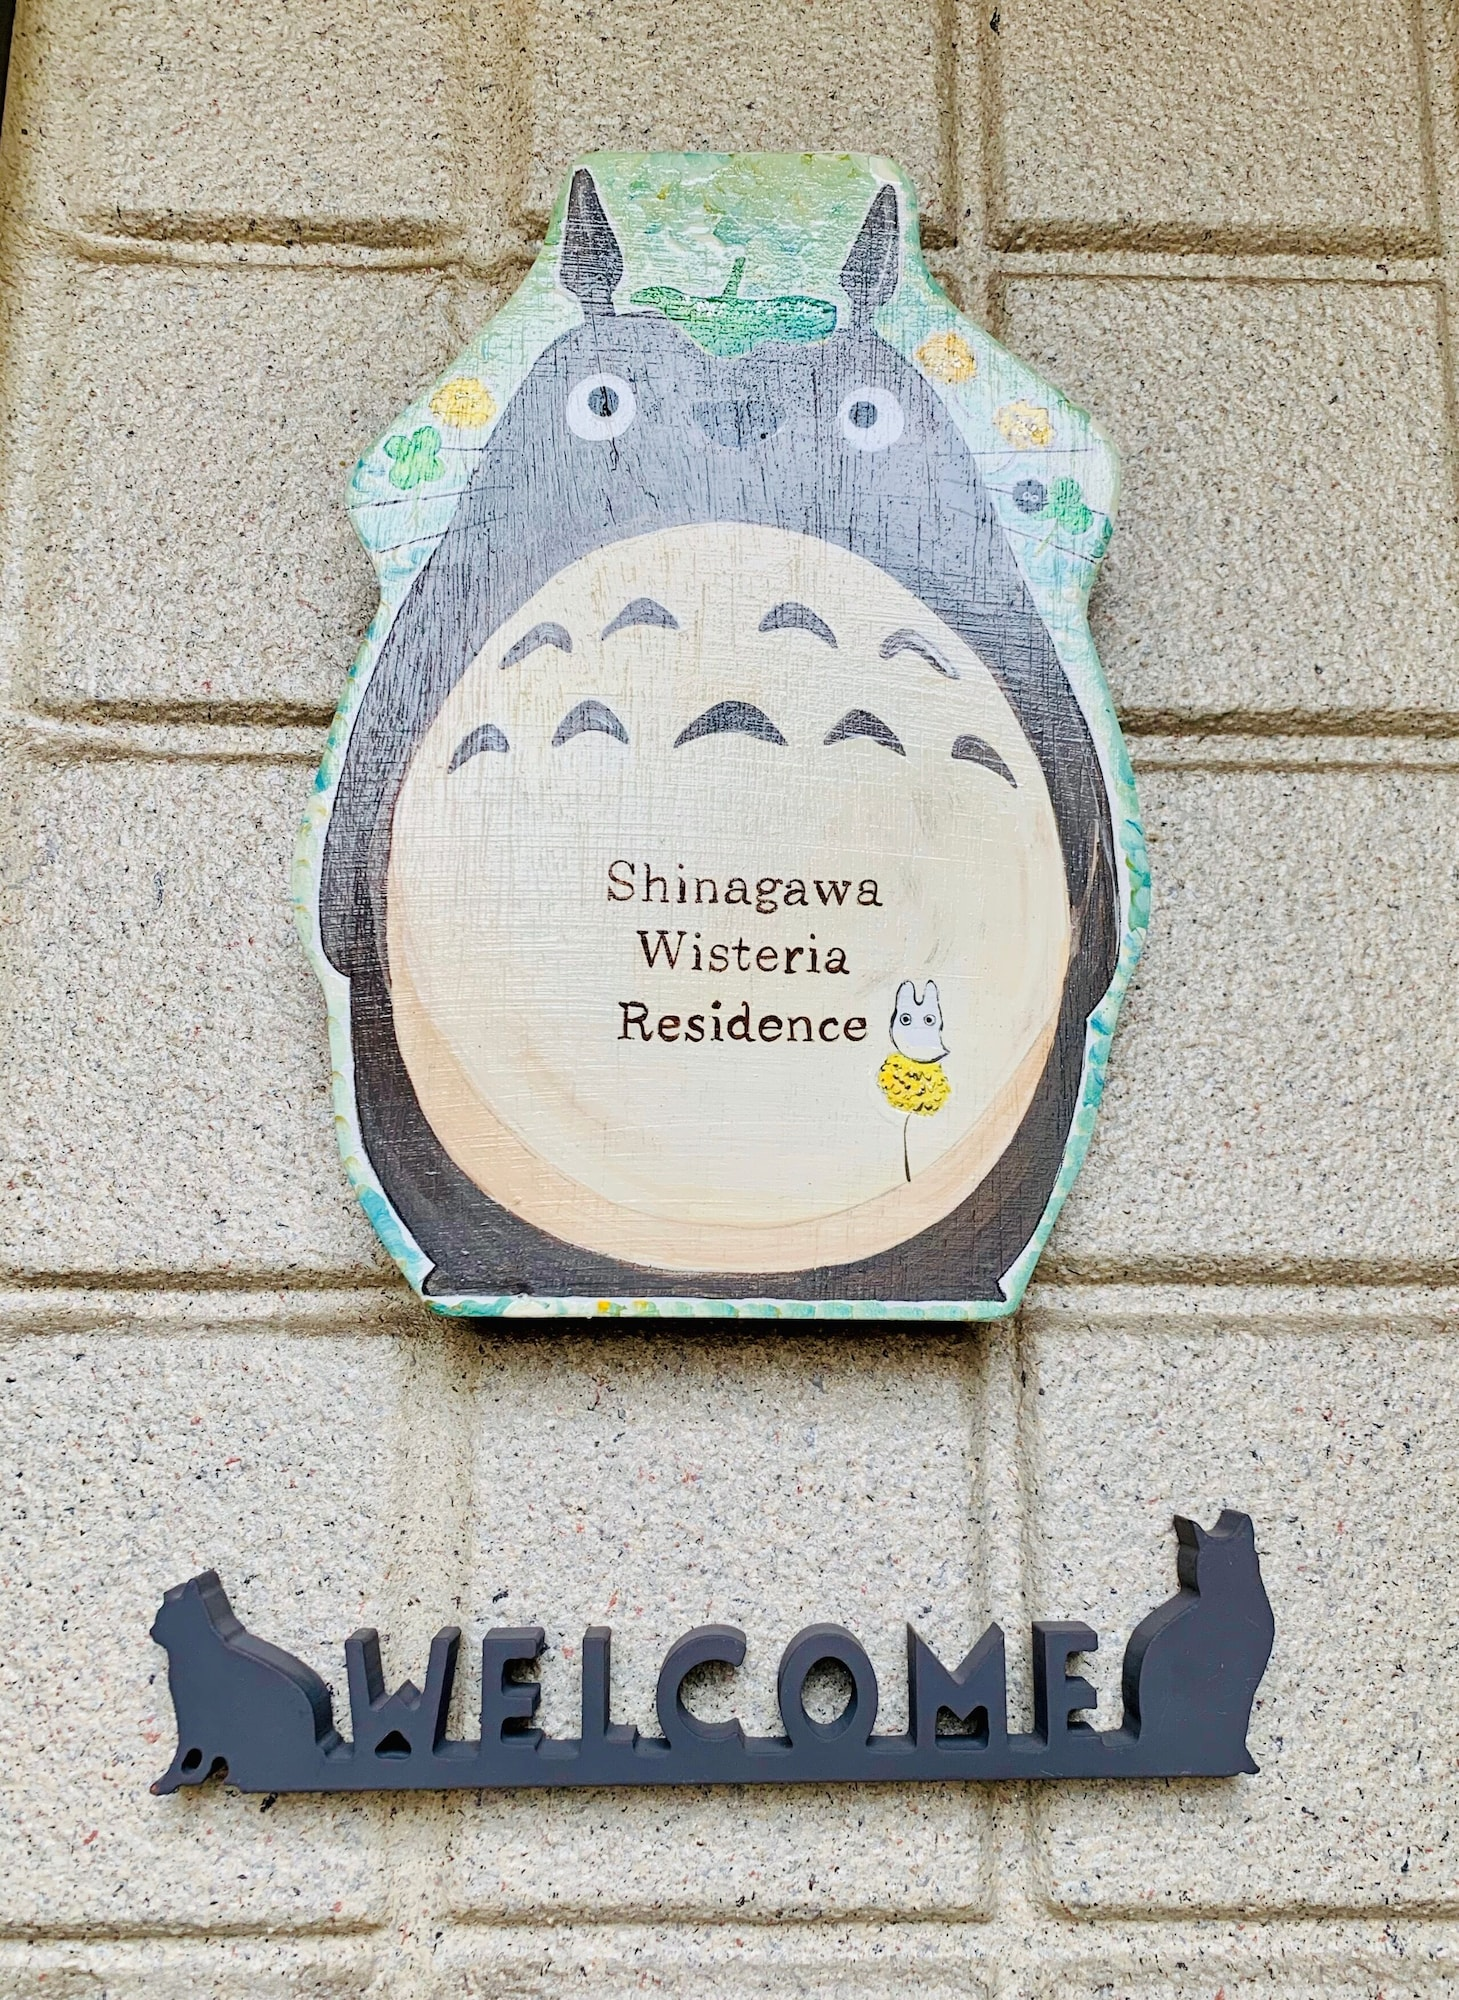 Shinagawa Wisteria Residence, Shinagawa